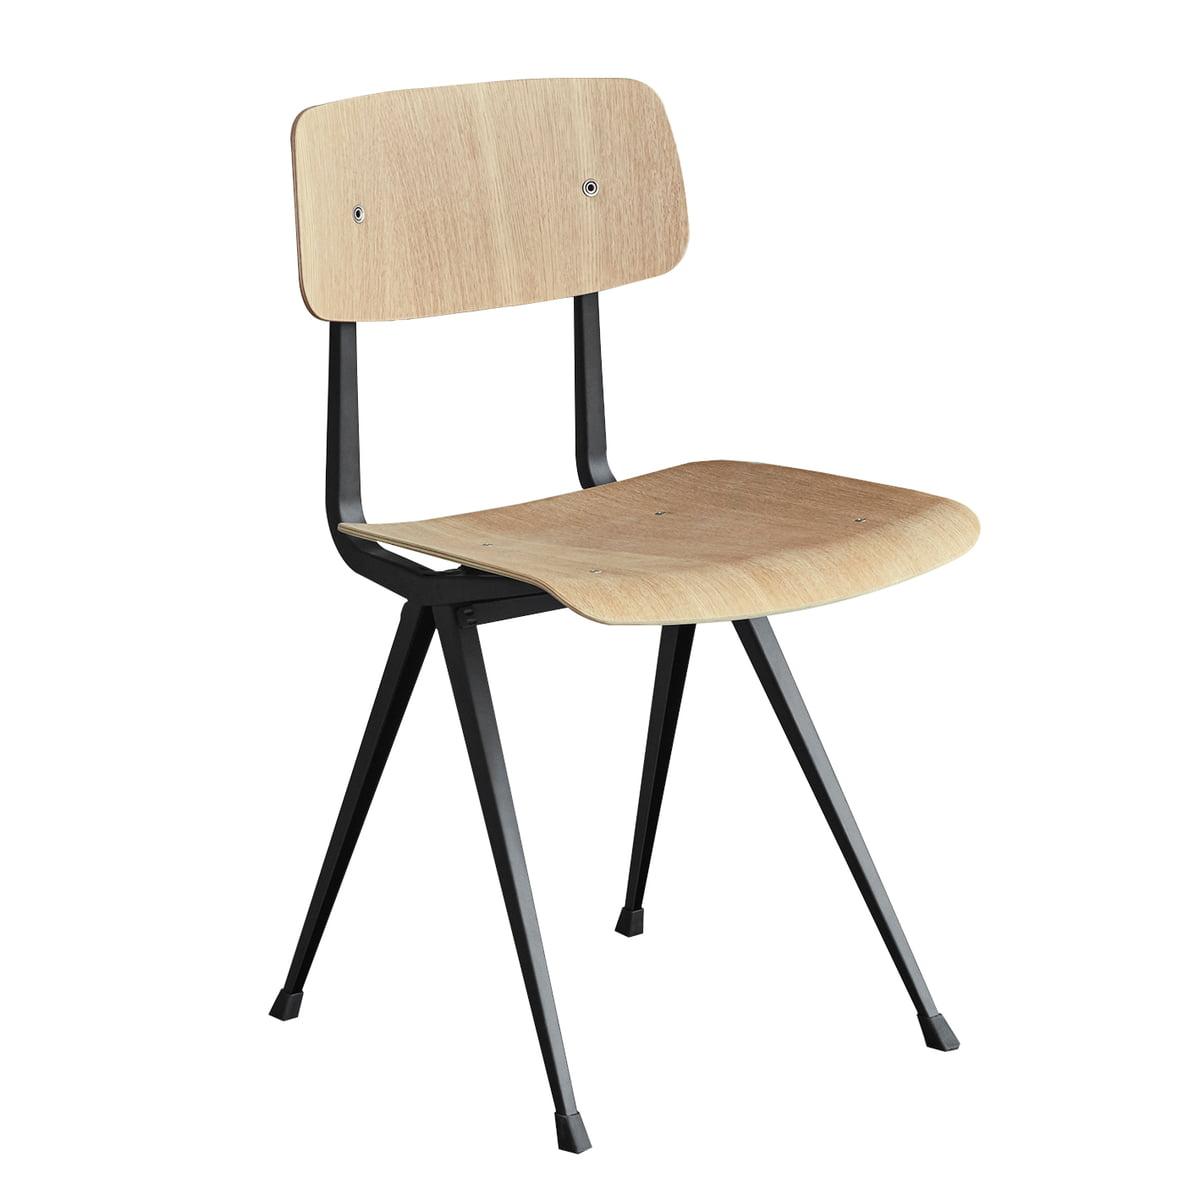 achetez la chaise result de hay en ligne hay. Black Bedroom Furniture Sets. Home Design Ideas